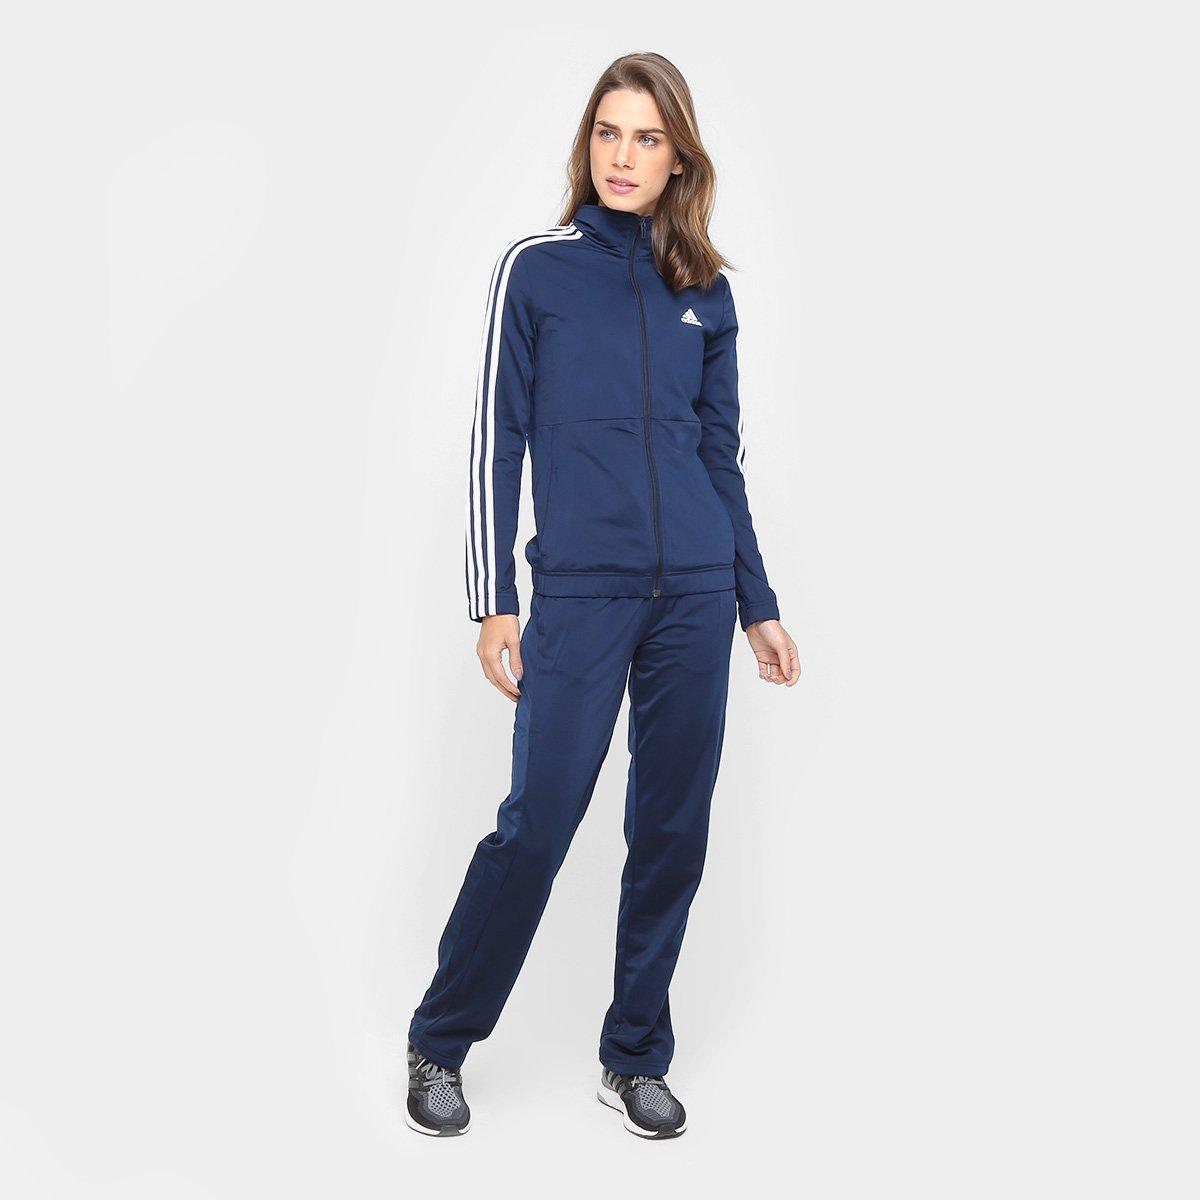 Agasalho adidas feminino netshoes